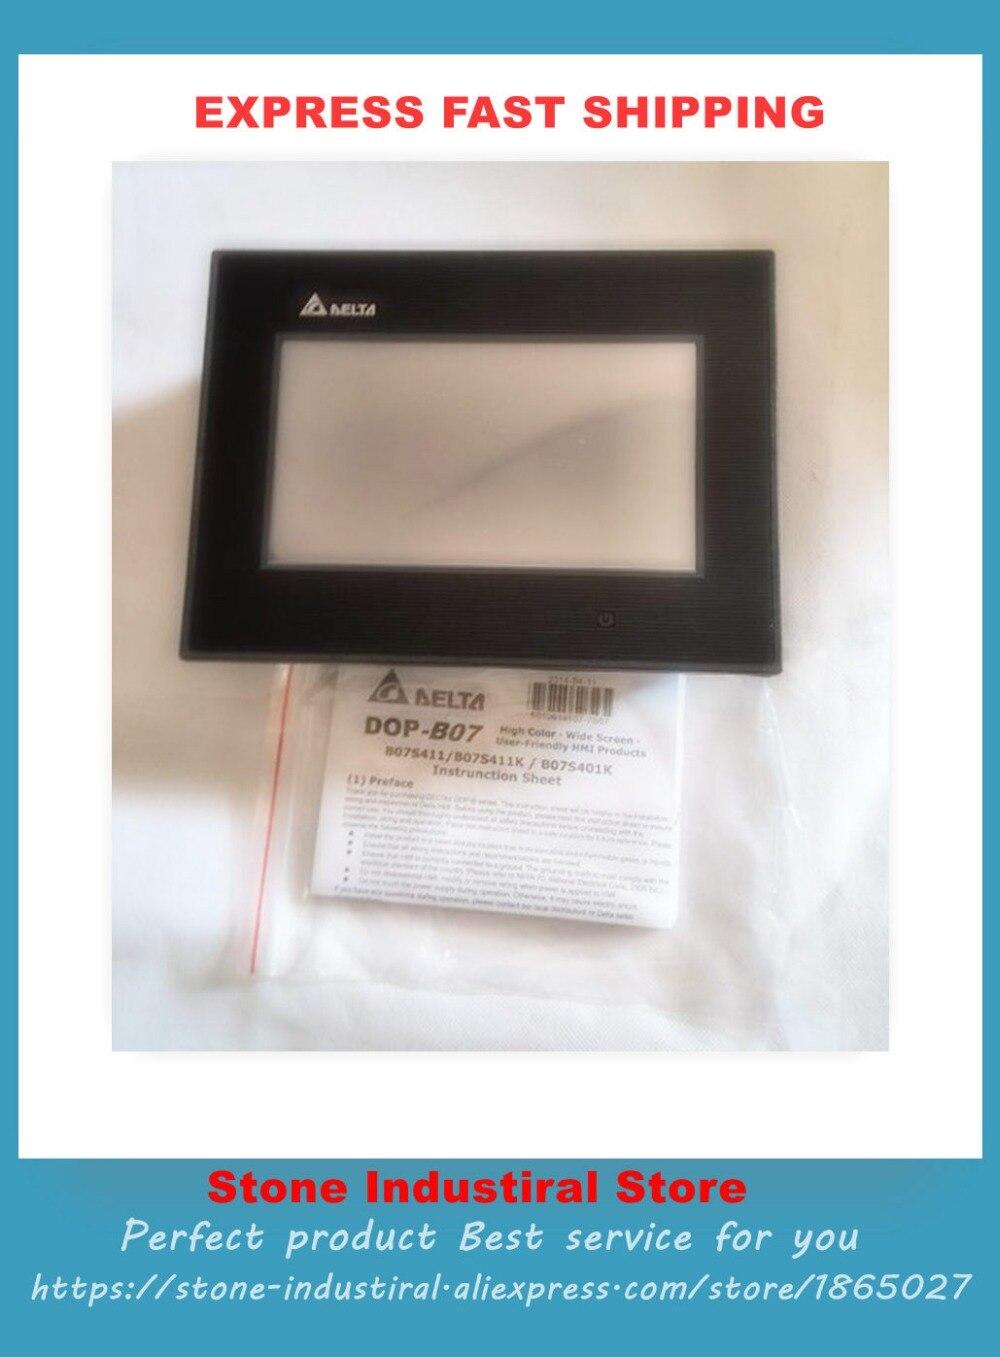 HMI DOP-B07S411 New Original HMI Touch Screen new 7 inch hmi dop b07ss411 can replace dop b07s410 or dop b07s411 touch panel screen